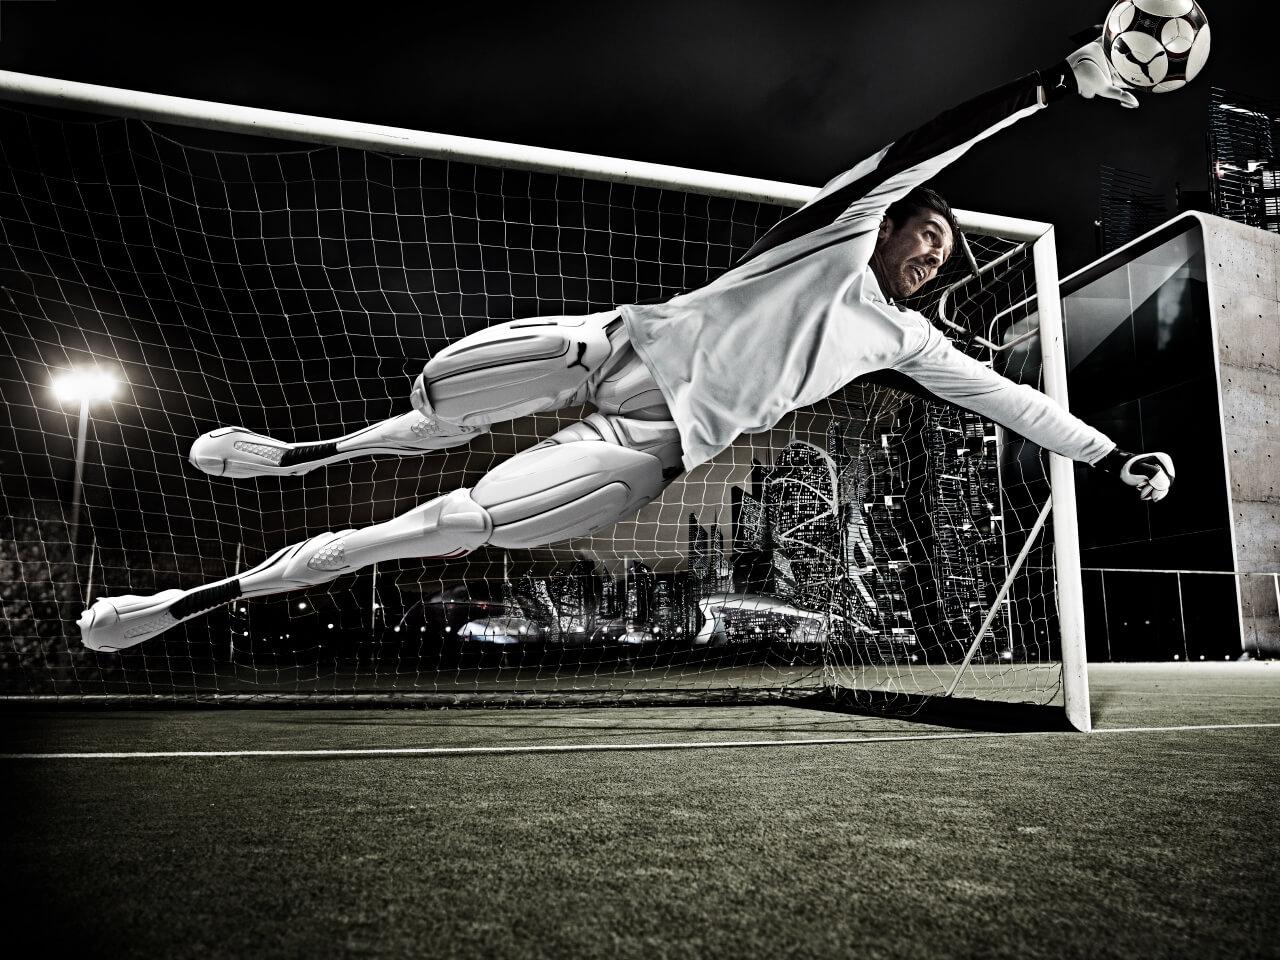 Futuristic Image Of Football Goalkeeper Buffon